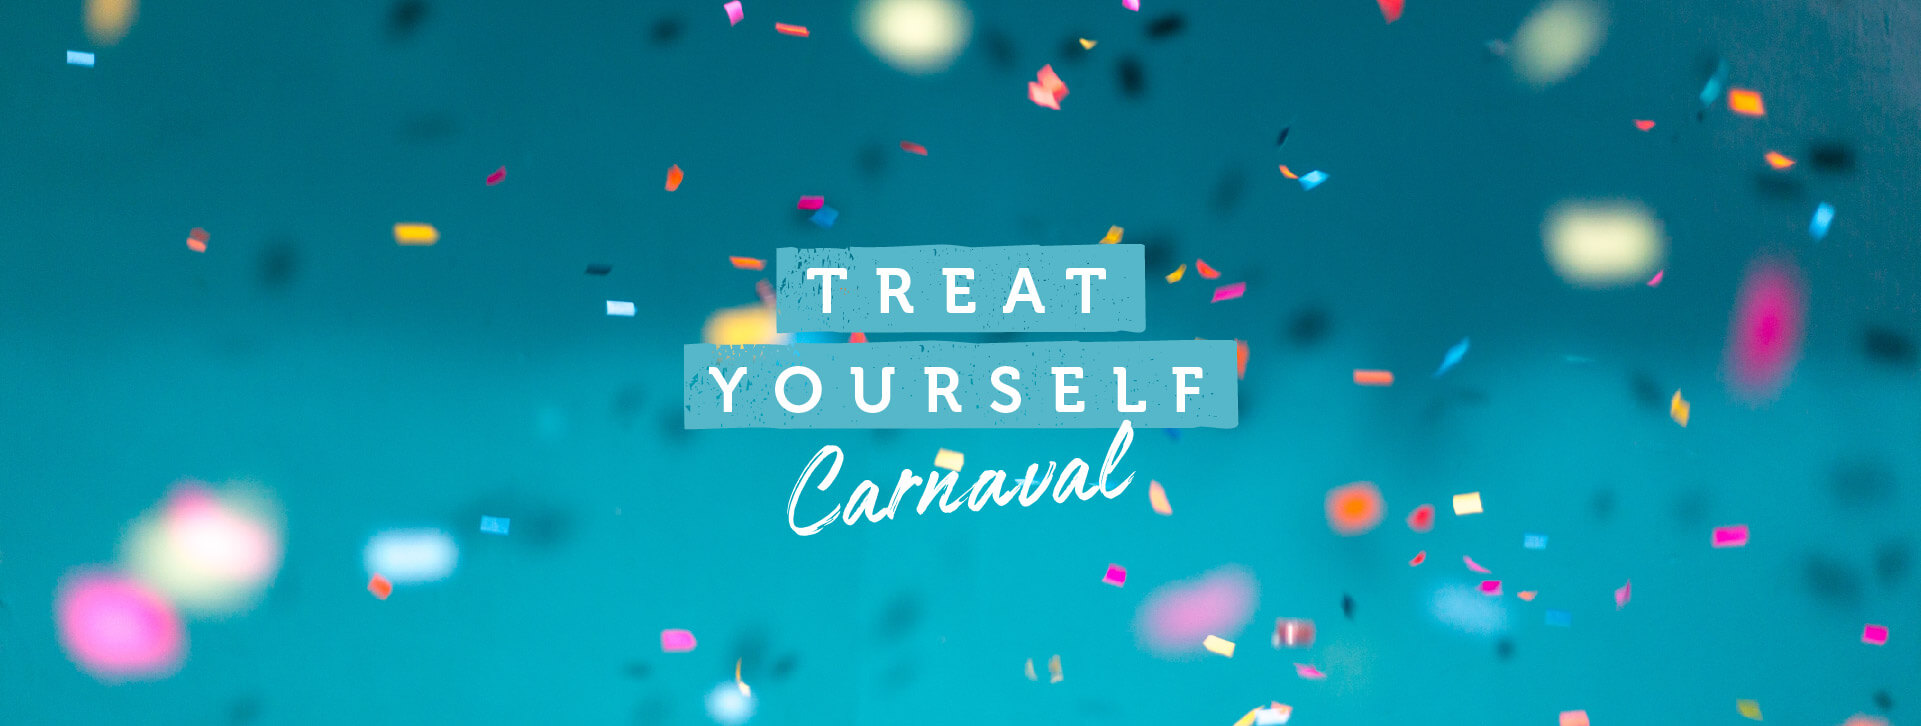 Forum Aveiro | Carnaval